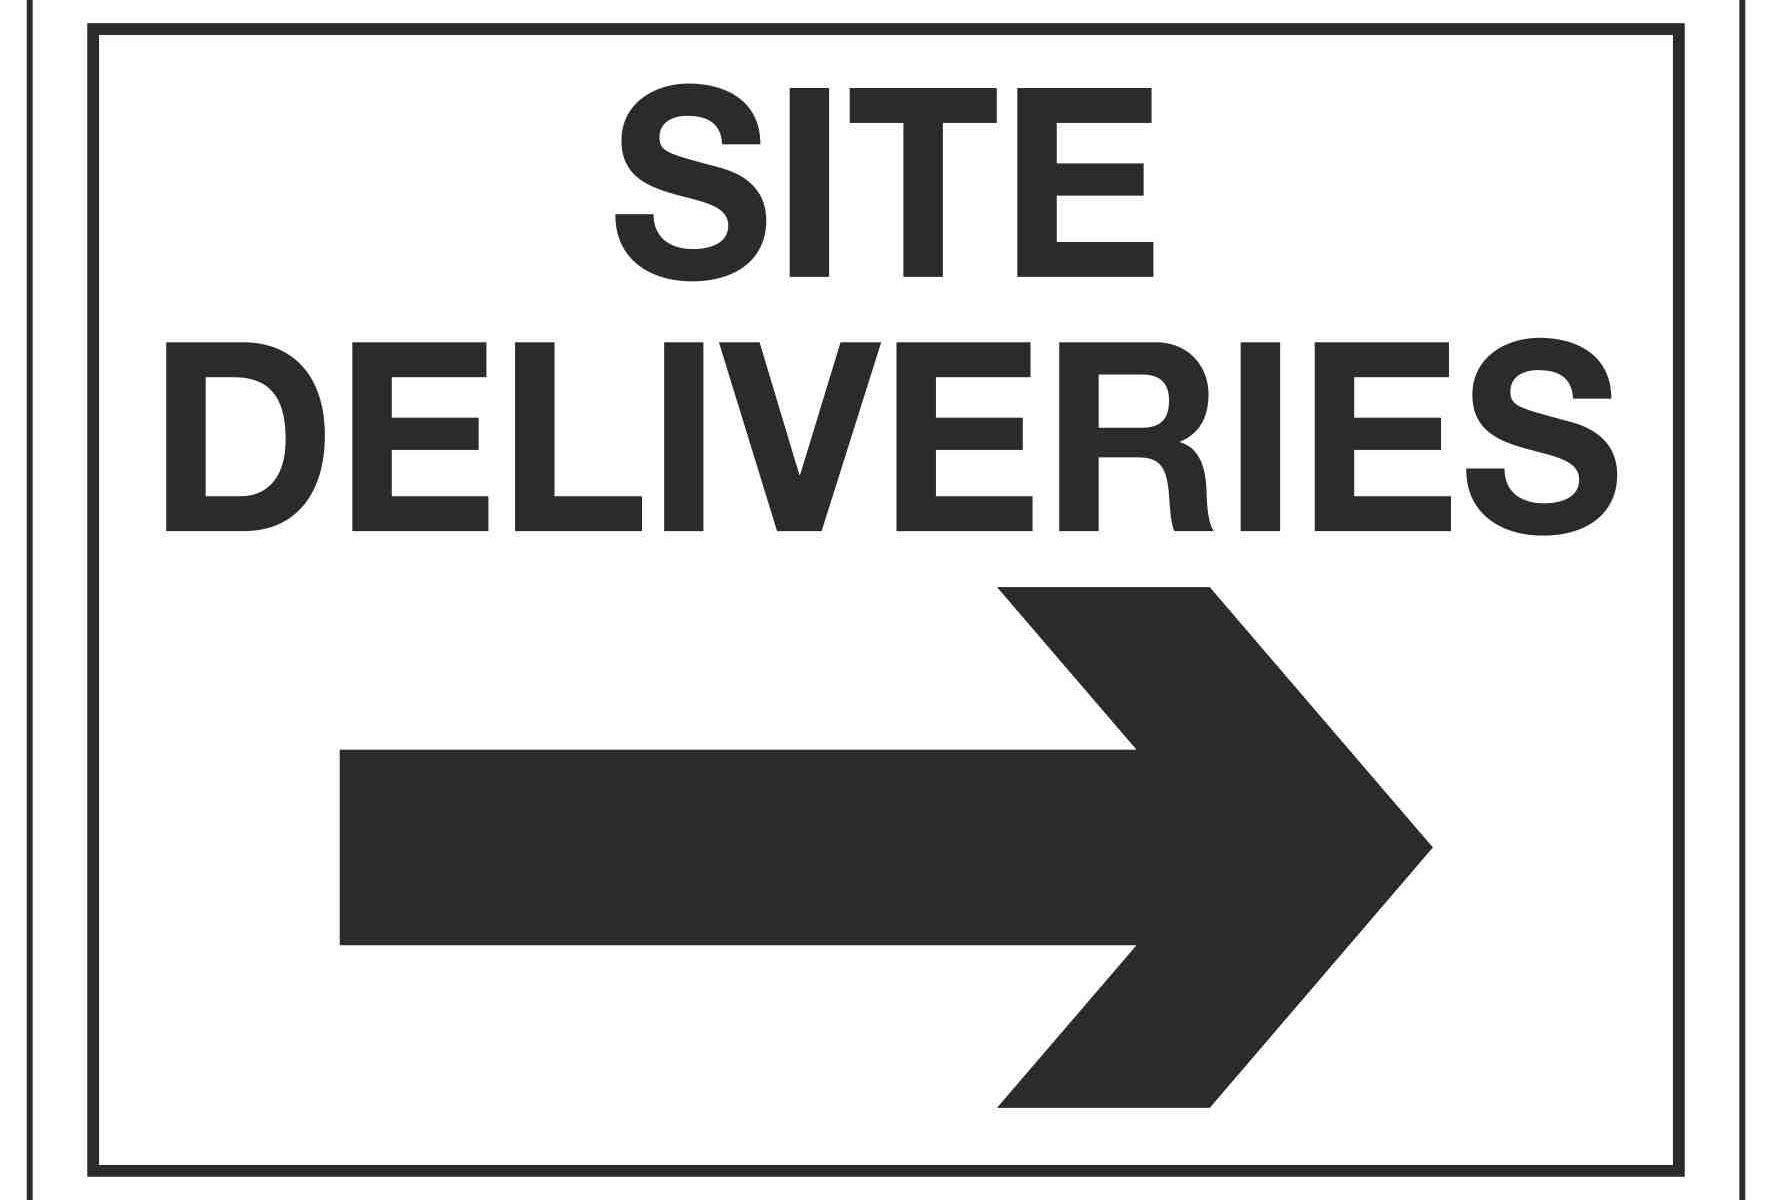 SITE DELIVERIES (Arrow right)